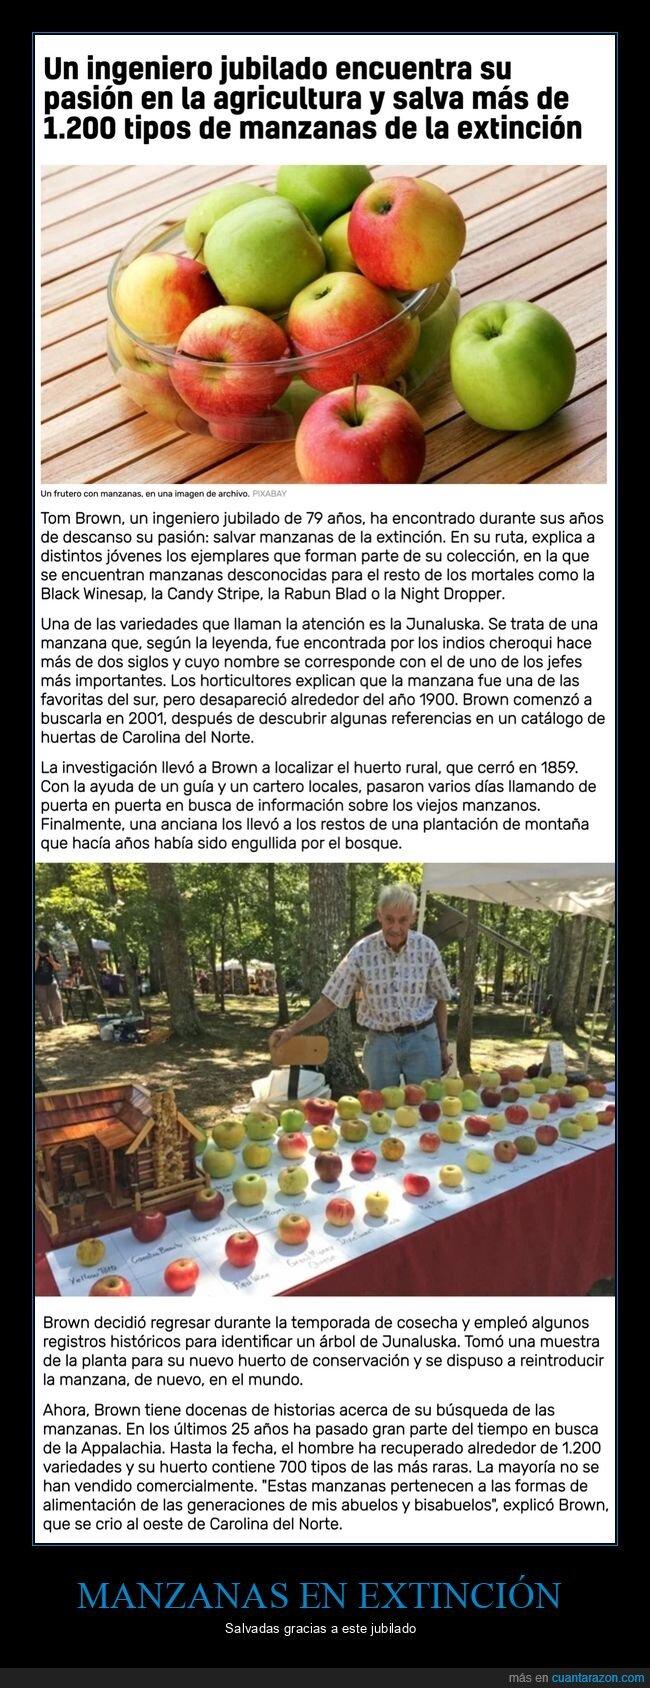 extinción,manzanas,salvadas